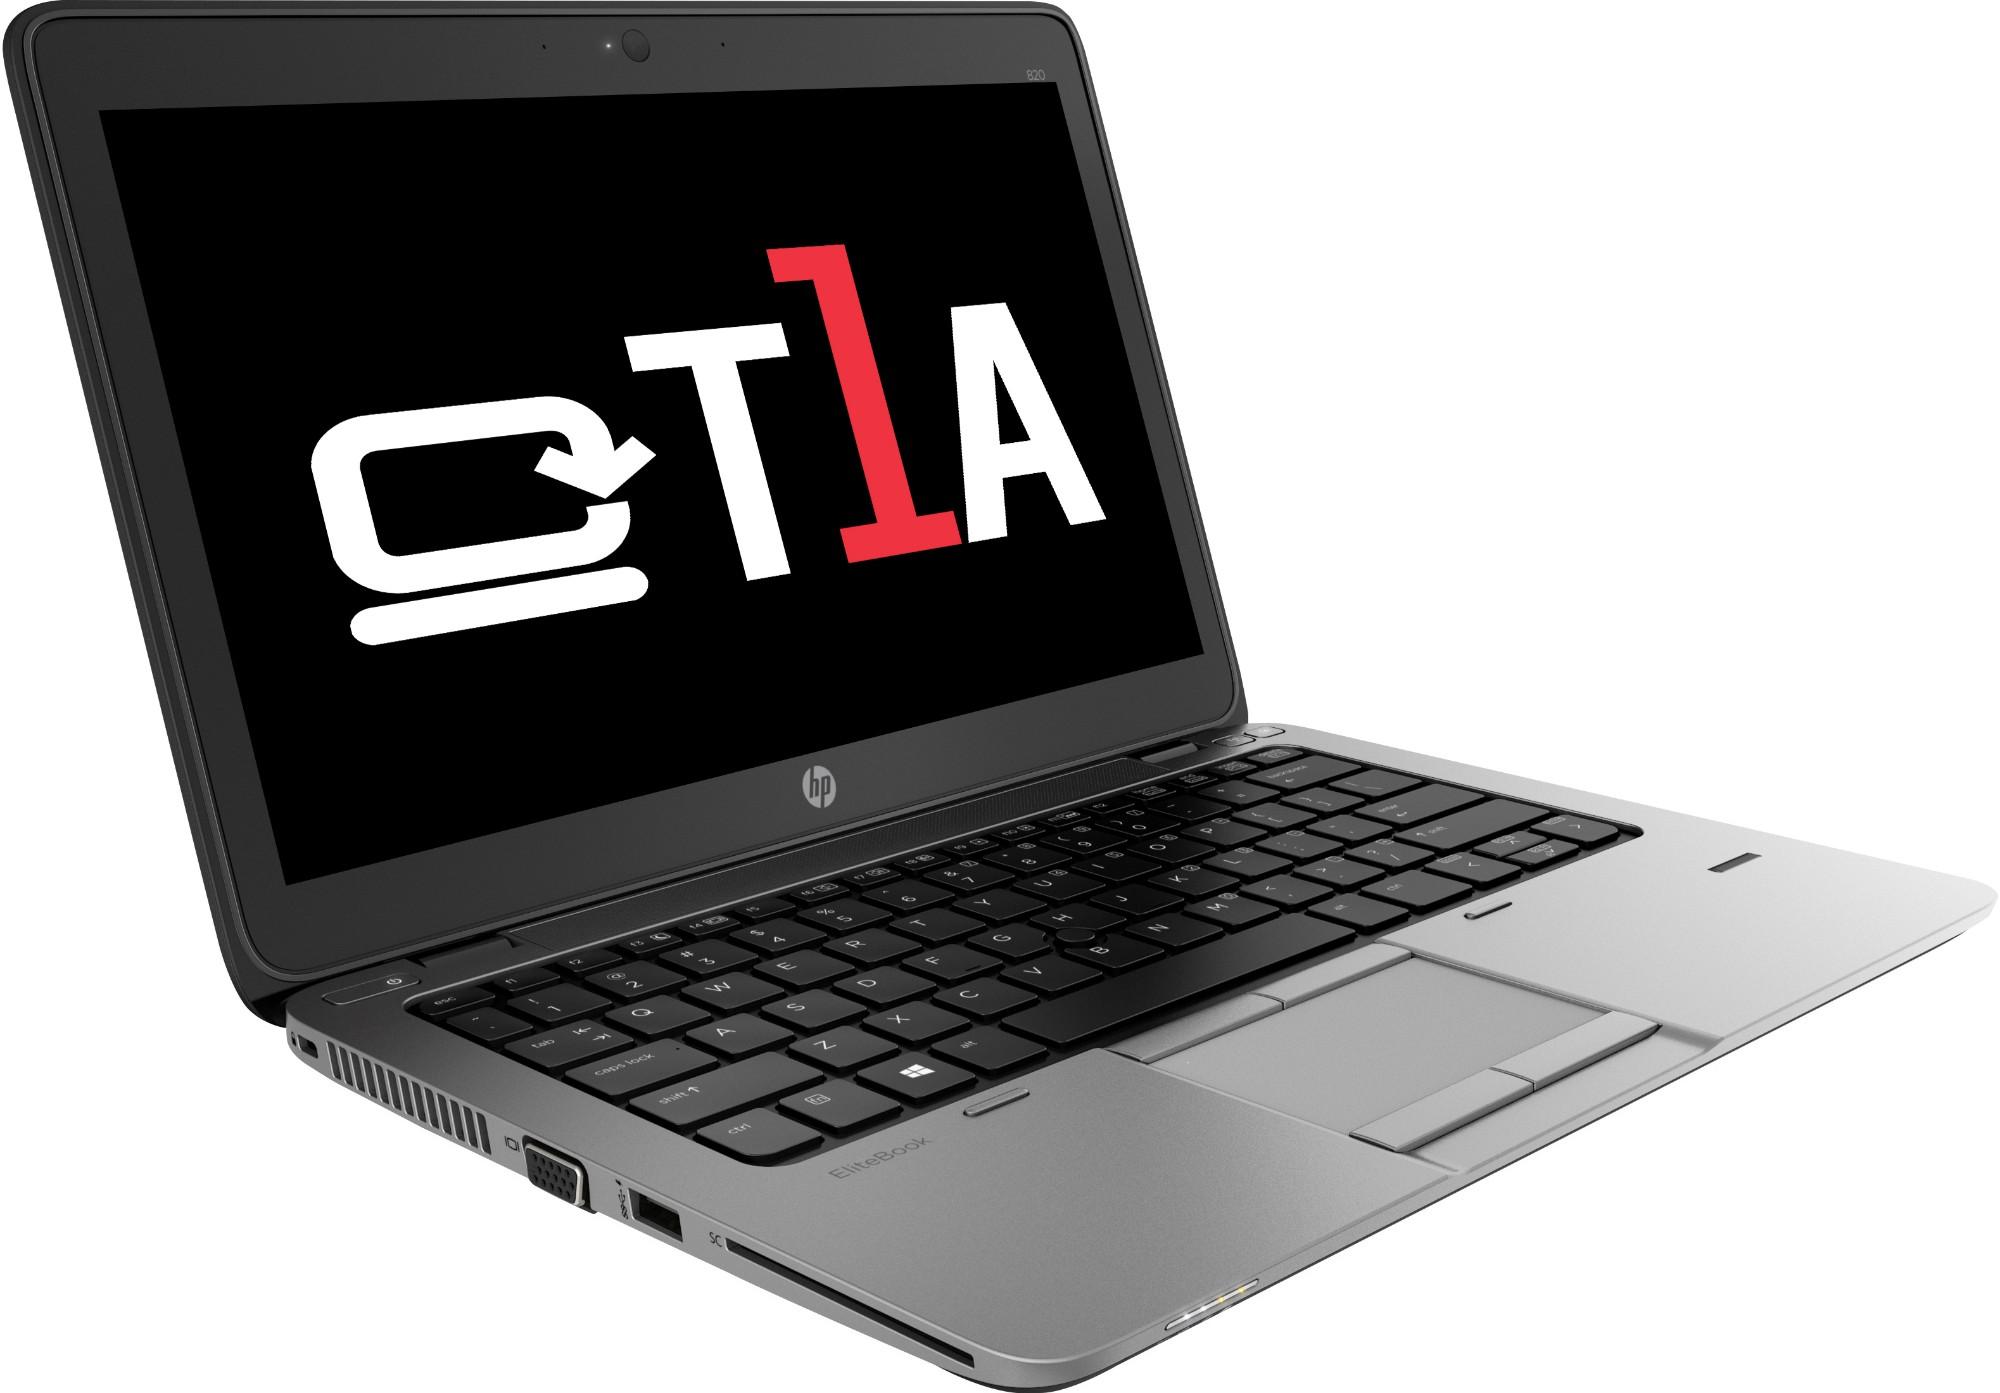 "T1A HP ELITEBOOK 820 G2 CORE I5-530 240GB SSD 8GB RAM 12.5IN Notebook Grey 31.8 cm (12.5"") 1366 x 768 pixels 5th gen Intel® Core™ i5 DDR3L-SDRAM Wi-Fi 4 (802.11n) Windows 10 Pro"